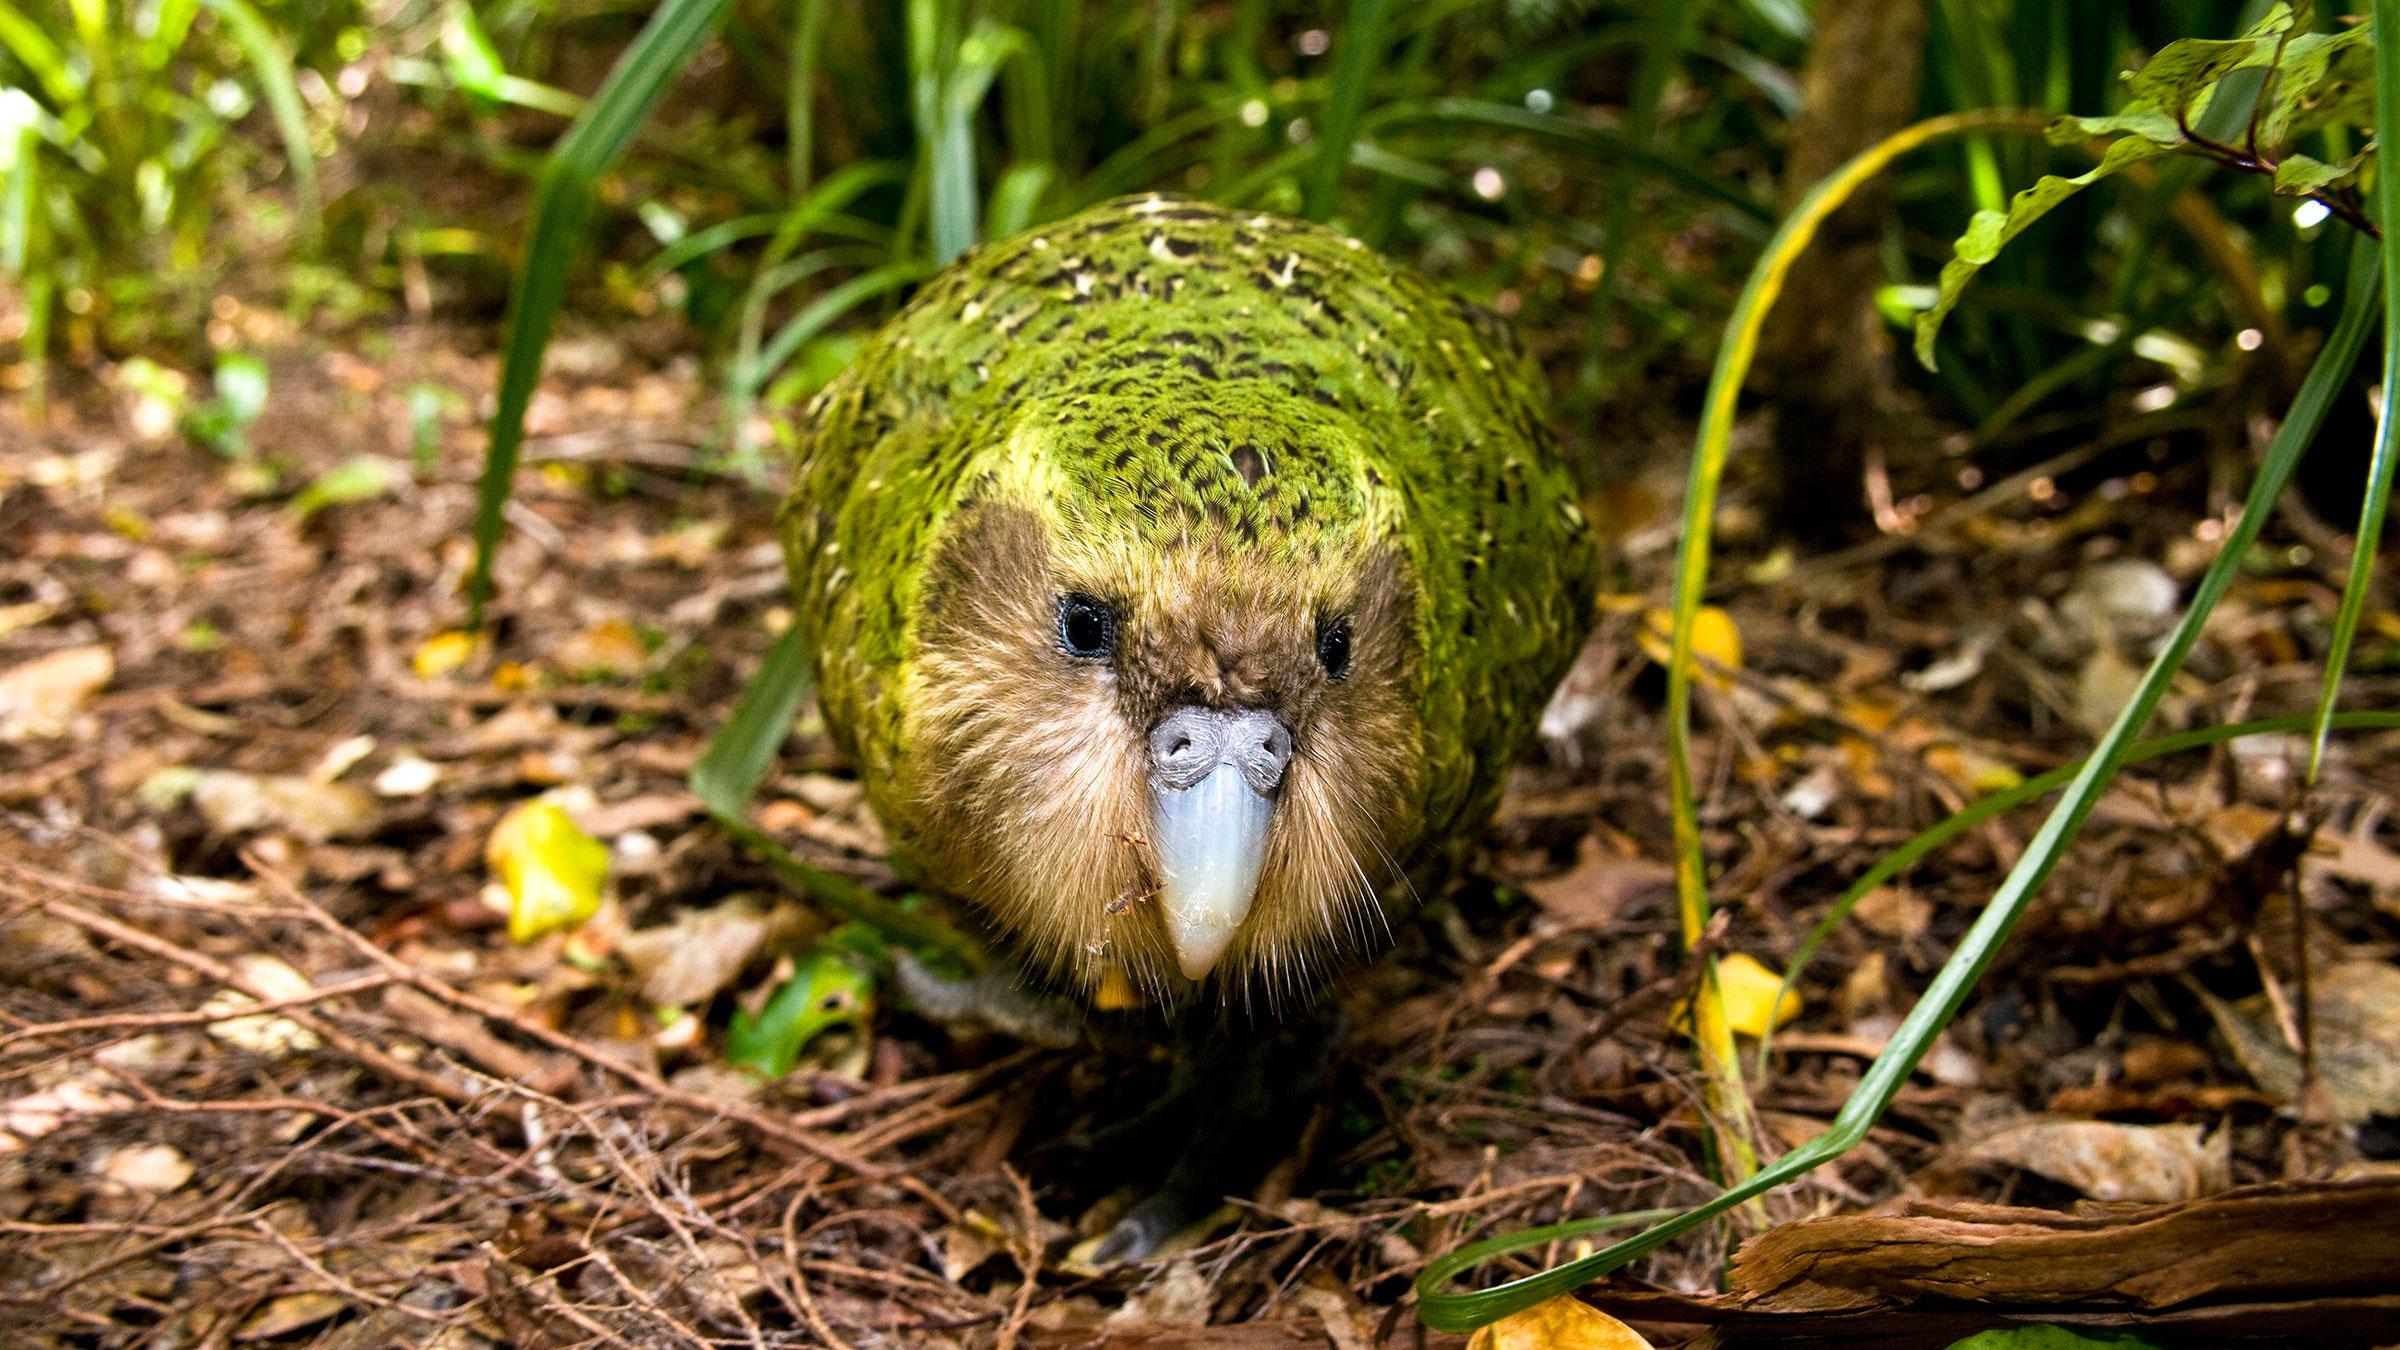 The Critically Endangered Kakapo Parrot Is Having One Fantastic Year |  Audubon